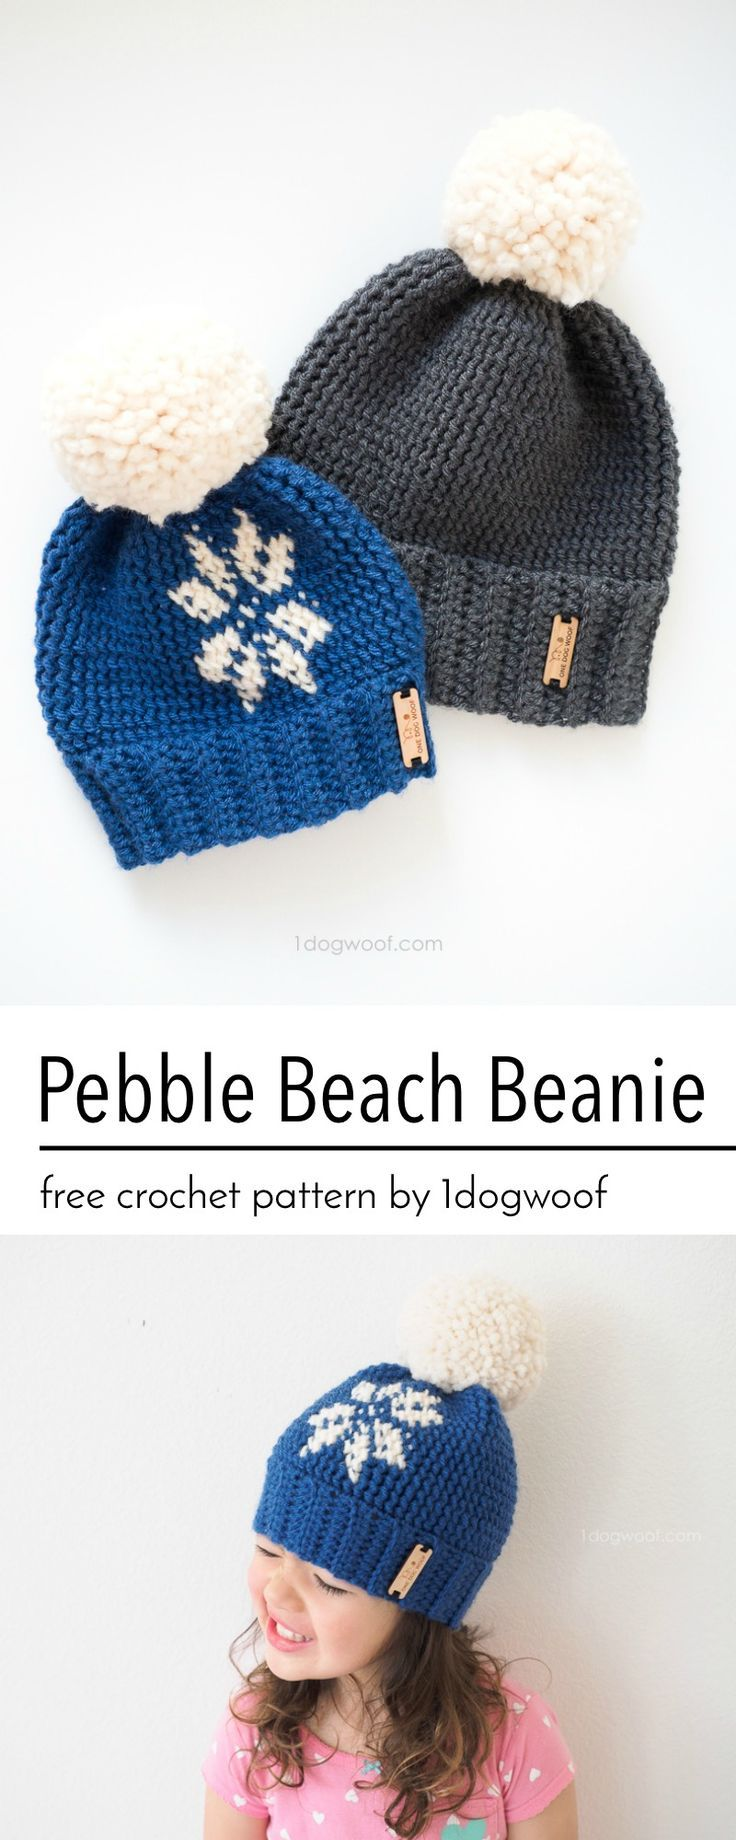 Pebble Beach Beanie Crochet Pattern | Pebble beach, Free crochet and ...